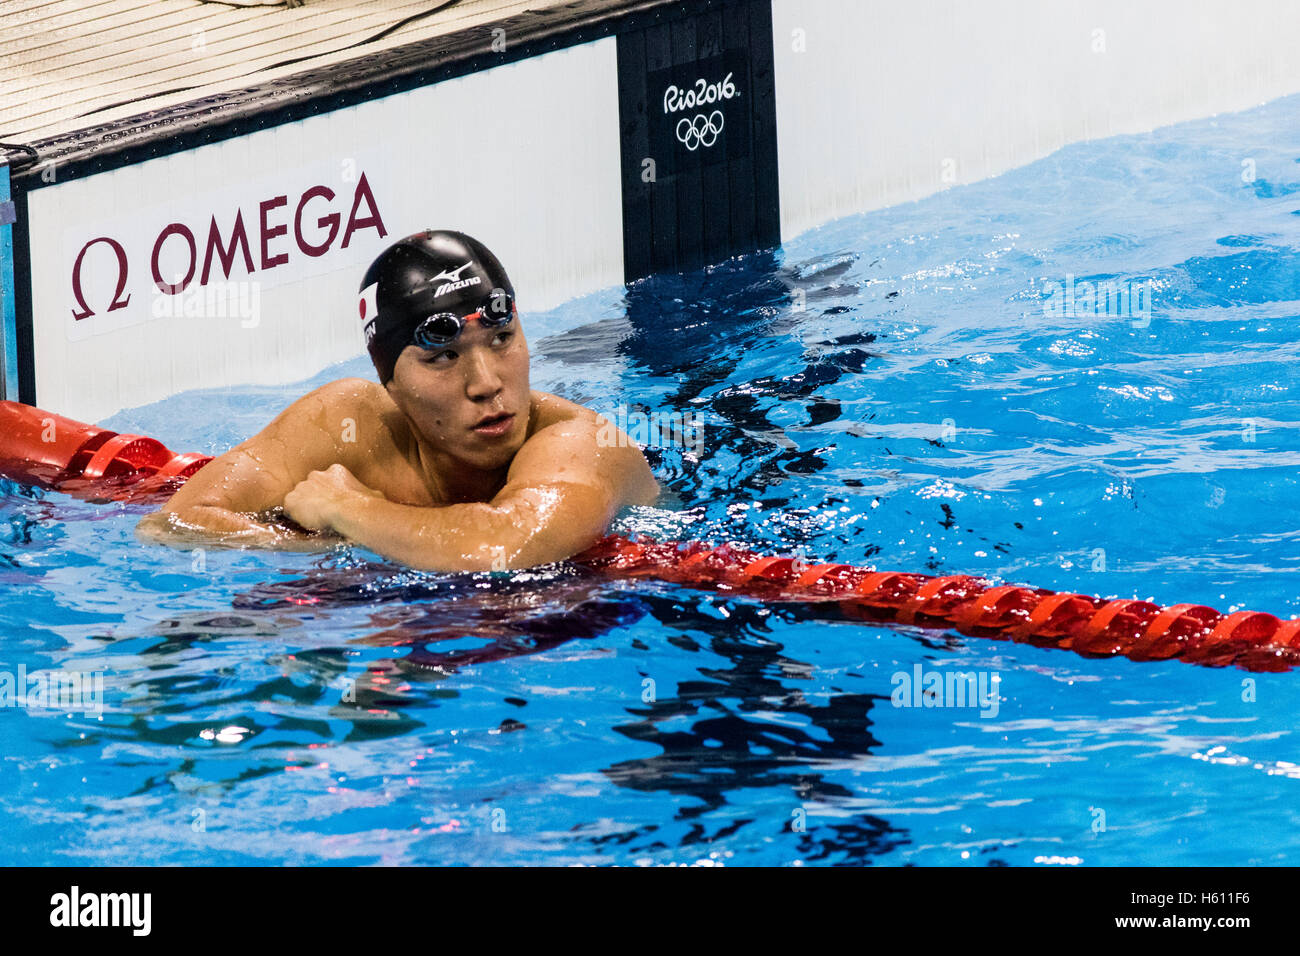 Rio de Janeiro, Brazil. 6 August 2016.Yasuhiro Koseki (JPN) competing in the Men's 100m Breaststroke semifinal - Stock Image